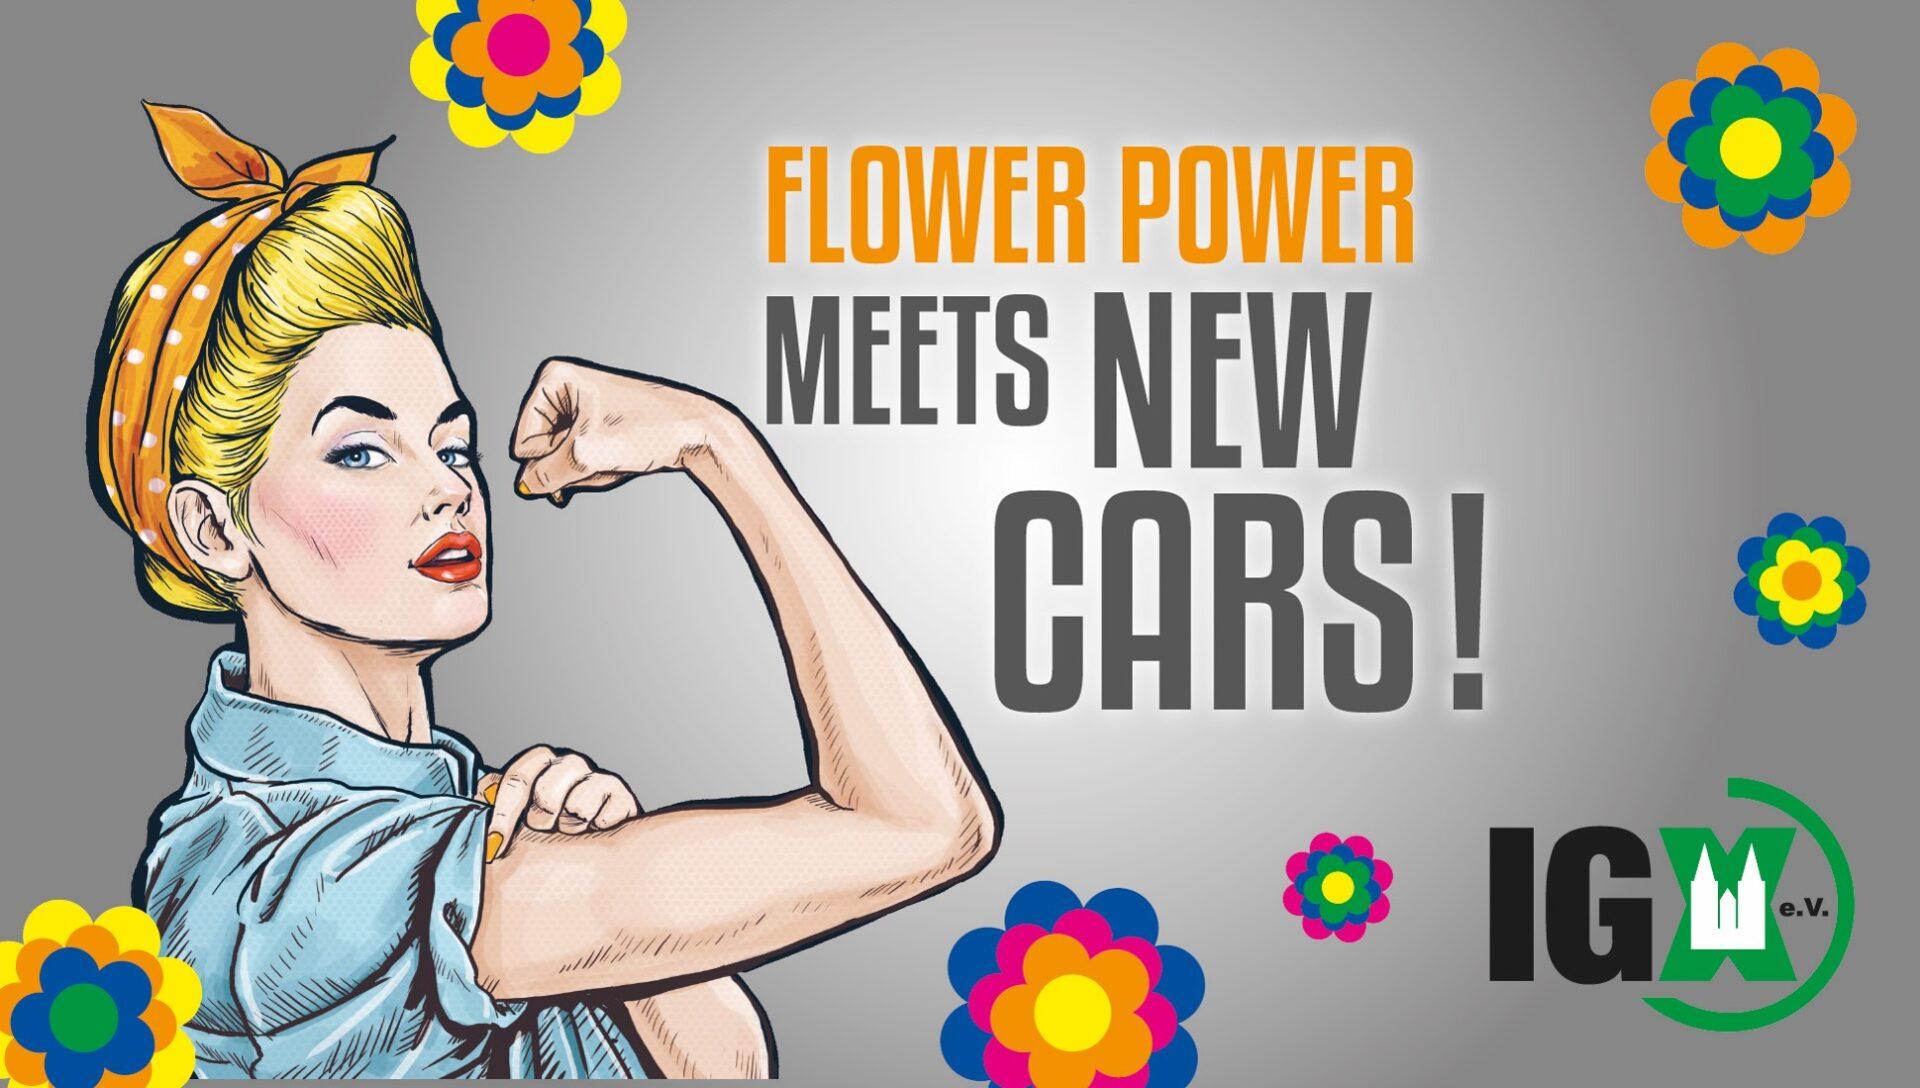 FLOWER POWER ...MEETS NEW CARS